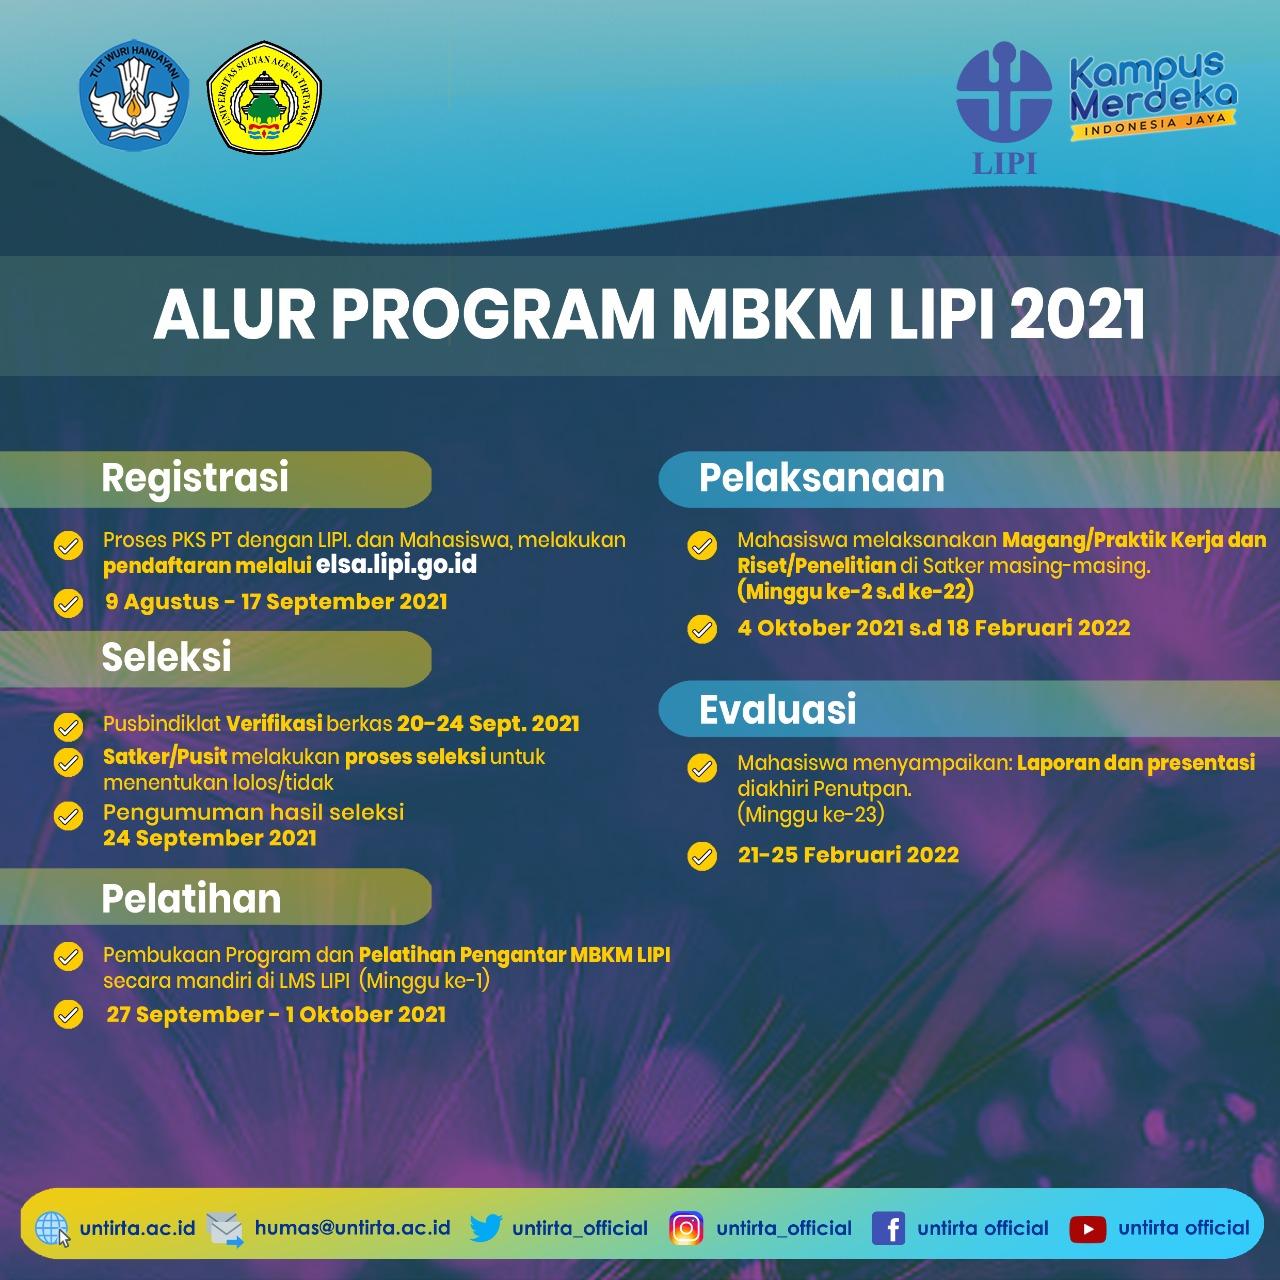 Alur Program MBKM LIPI 2021